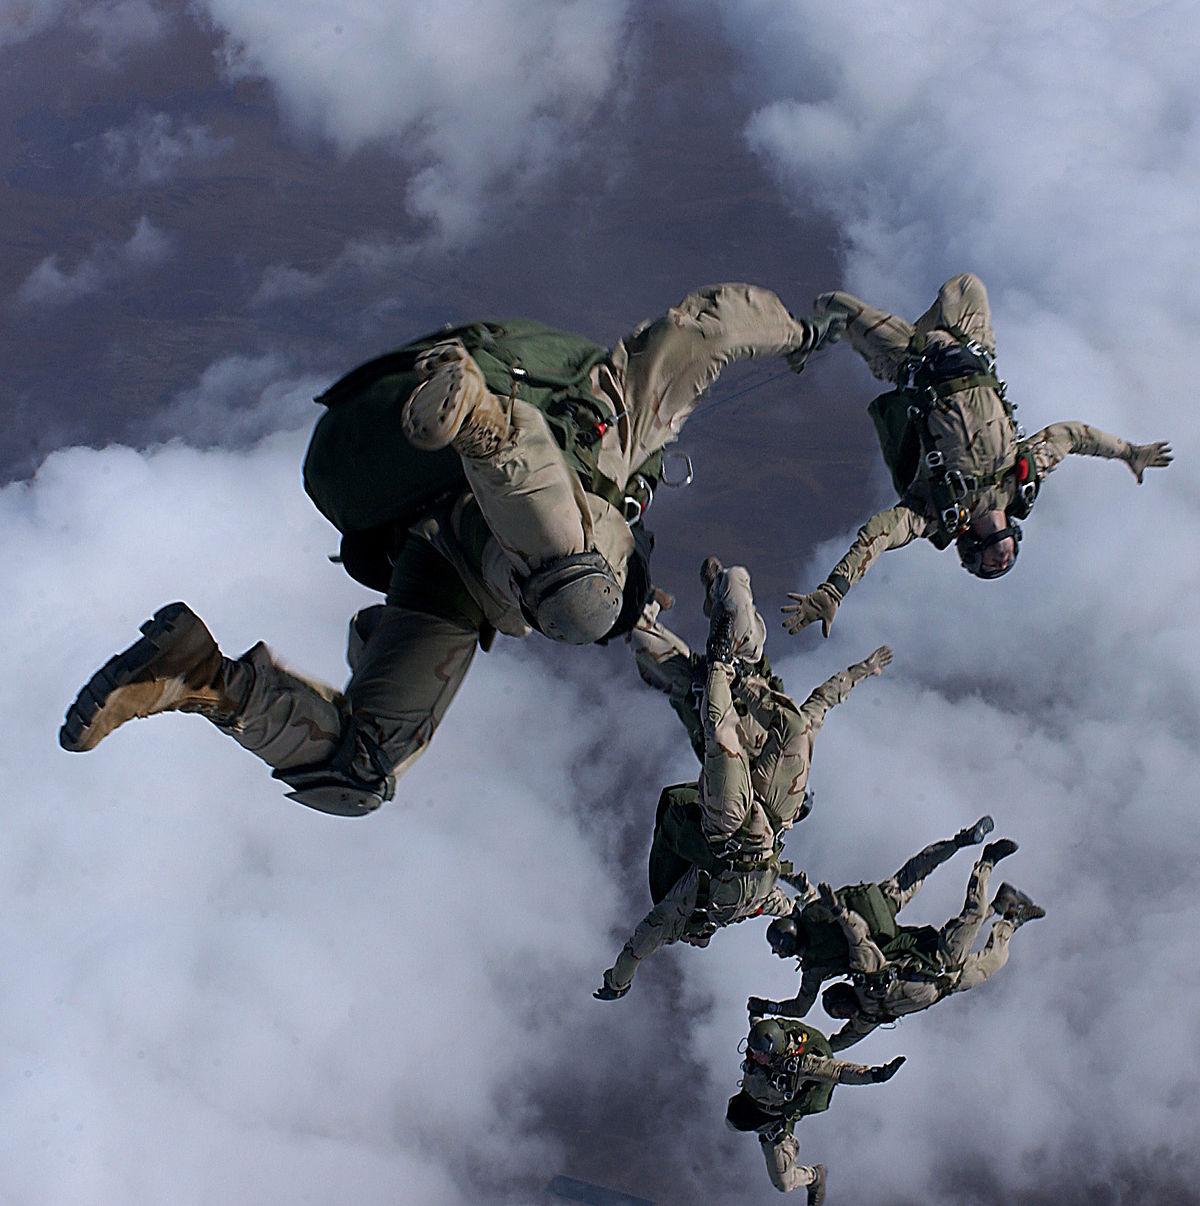 High Altitude Military Parachuting Wikipedia